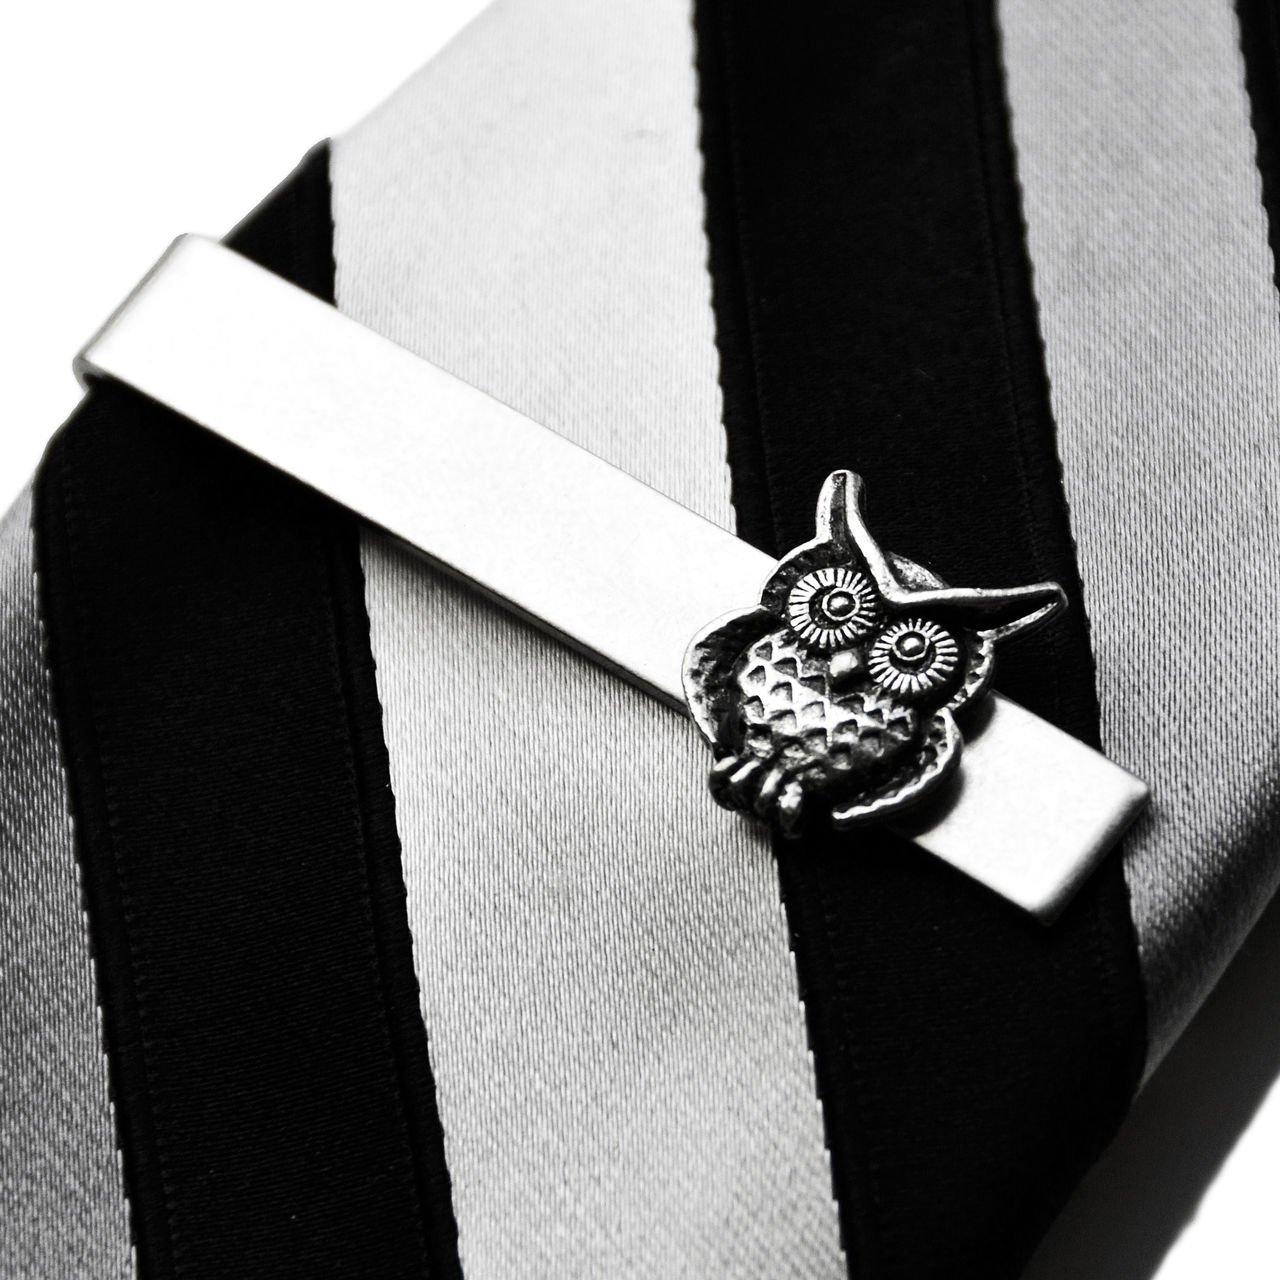 Quality Handcrafts Guaranteed Owl Tie Clip